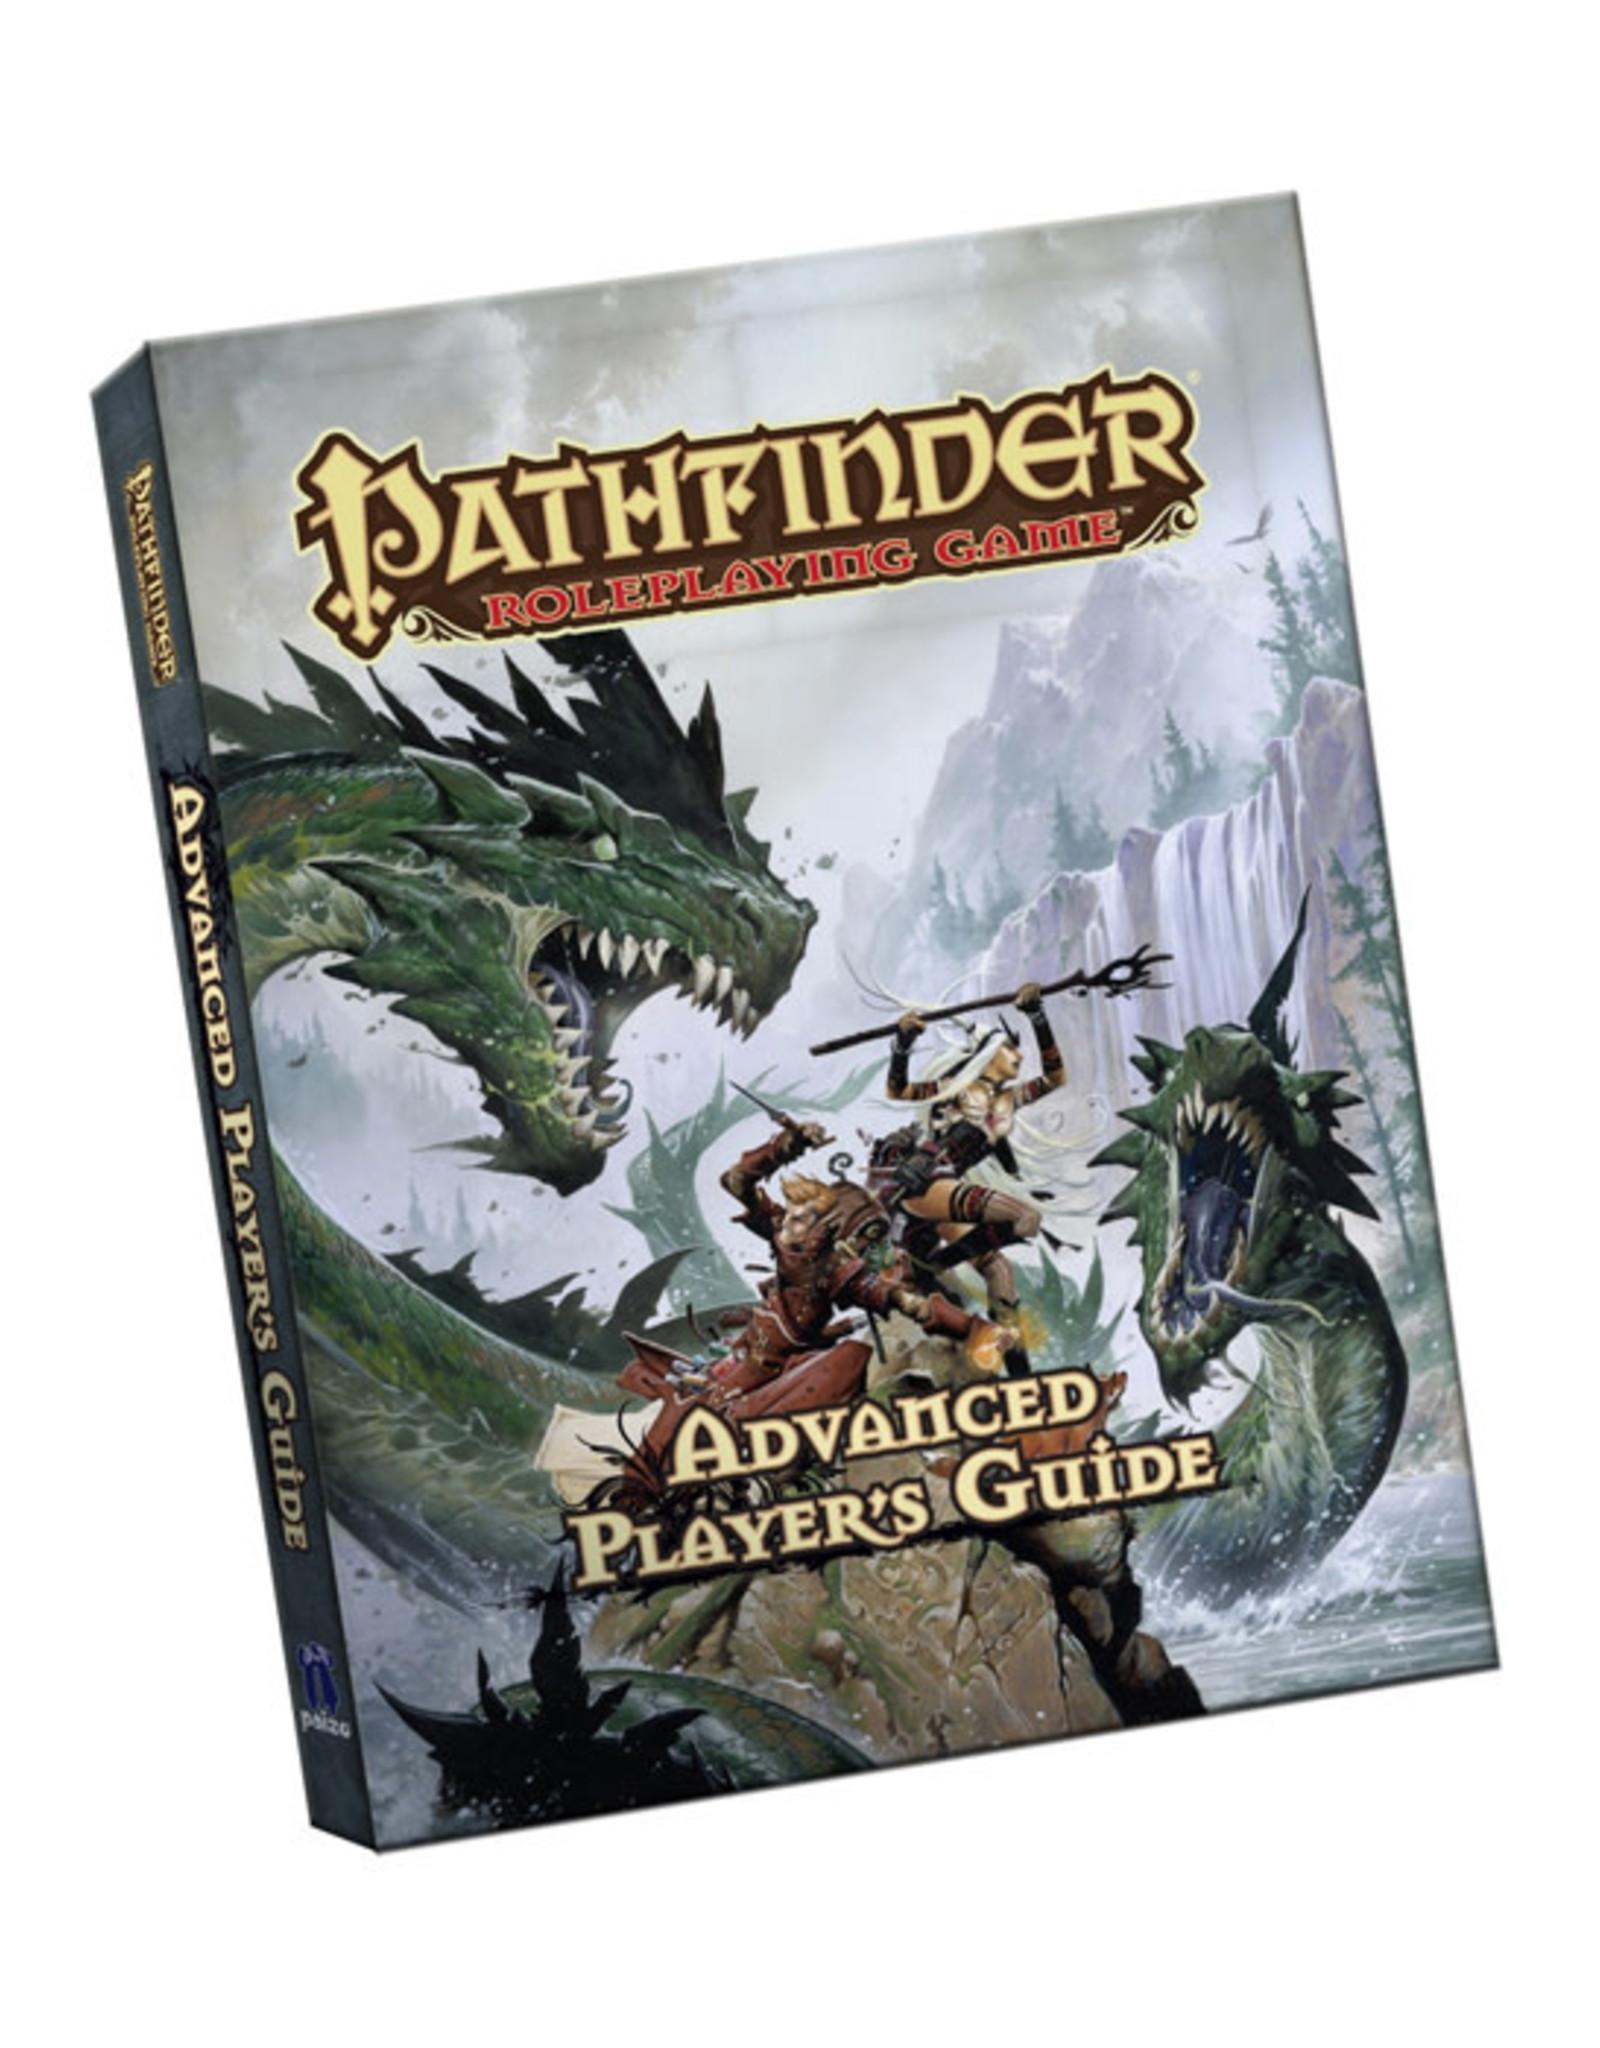 Pathfinder Pathfinder: Advanced Player's Guide